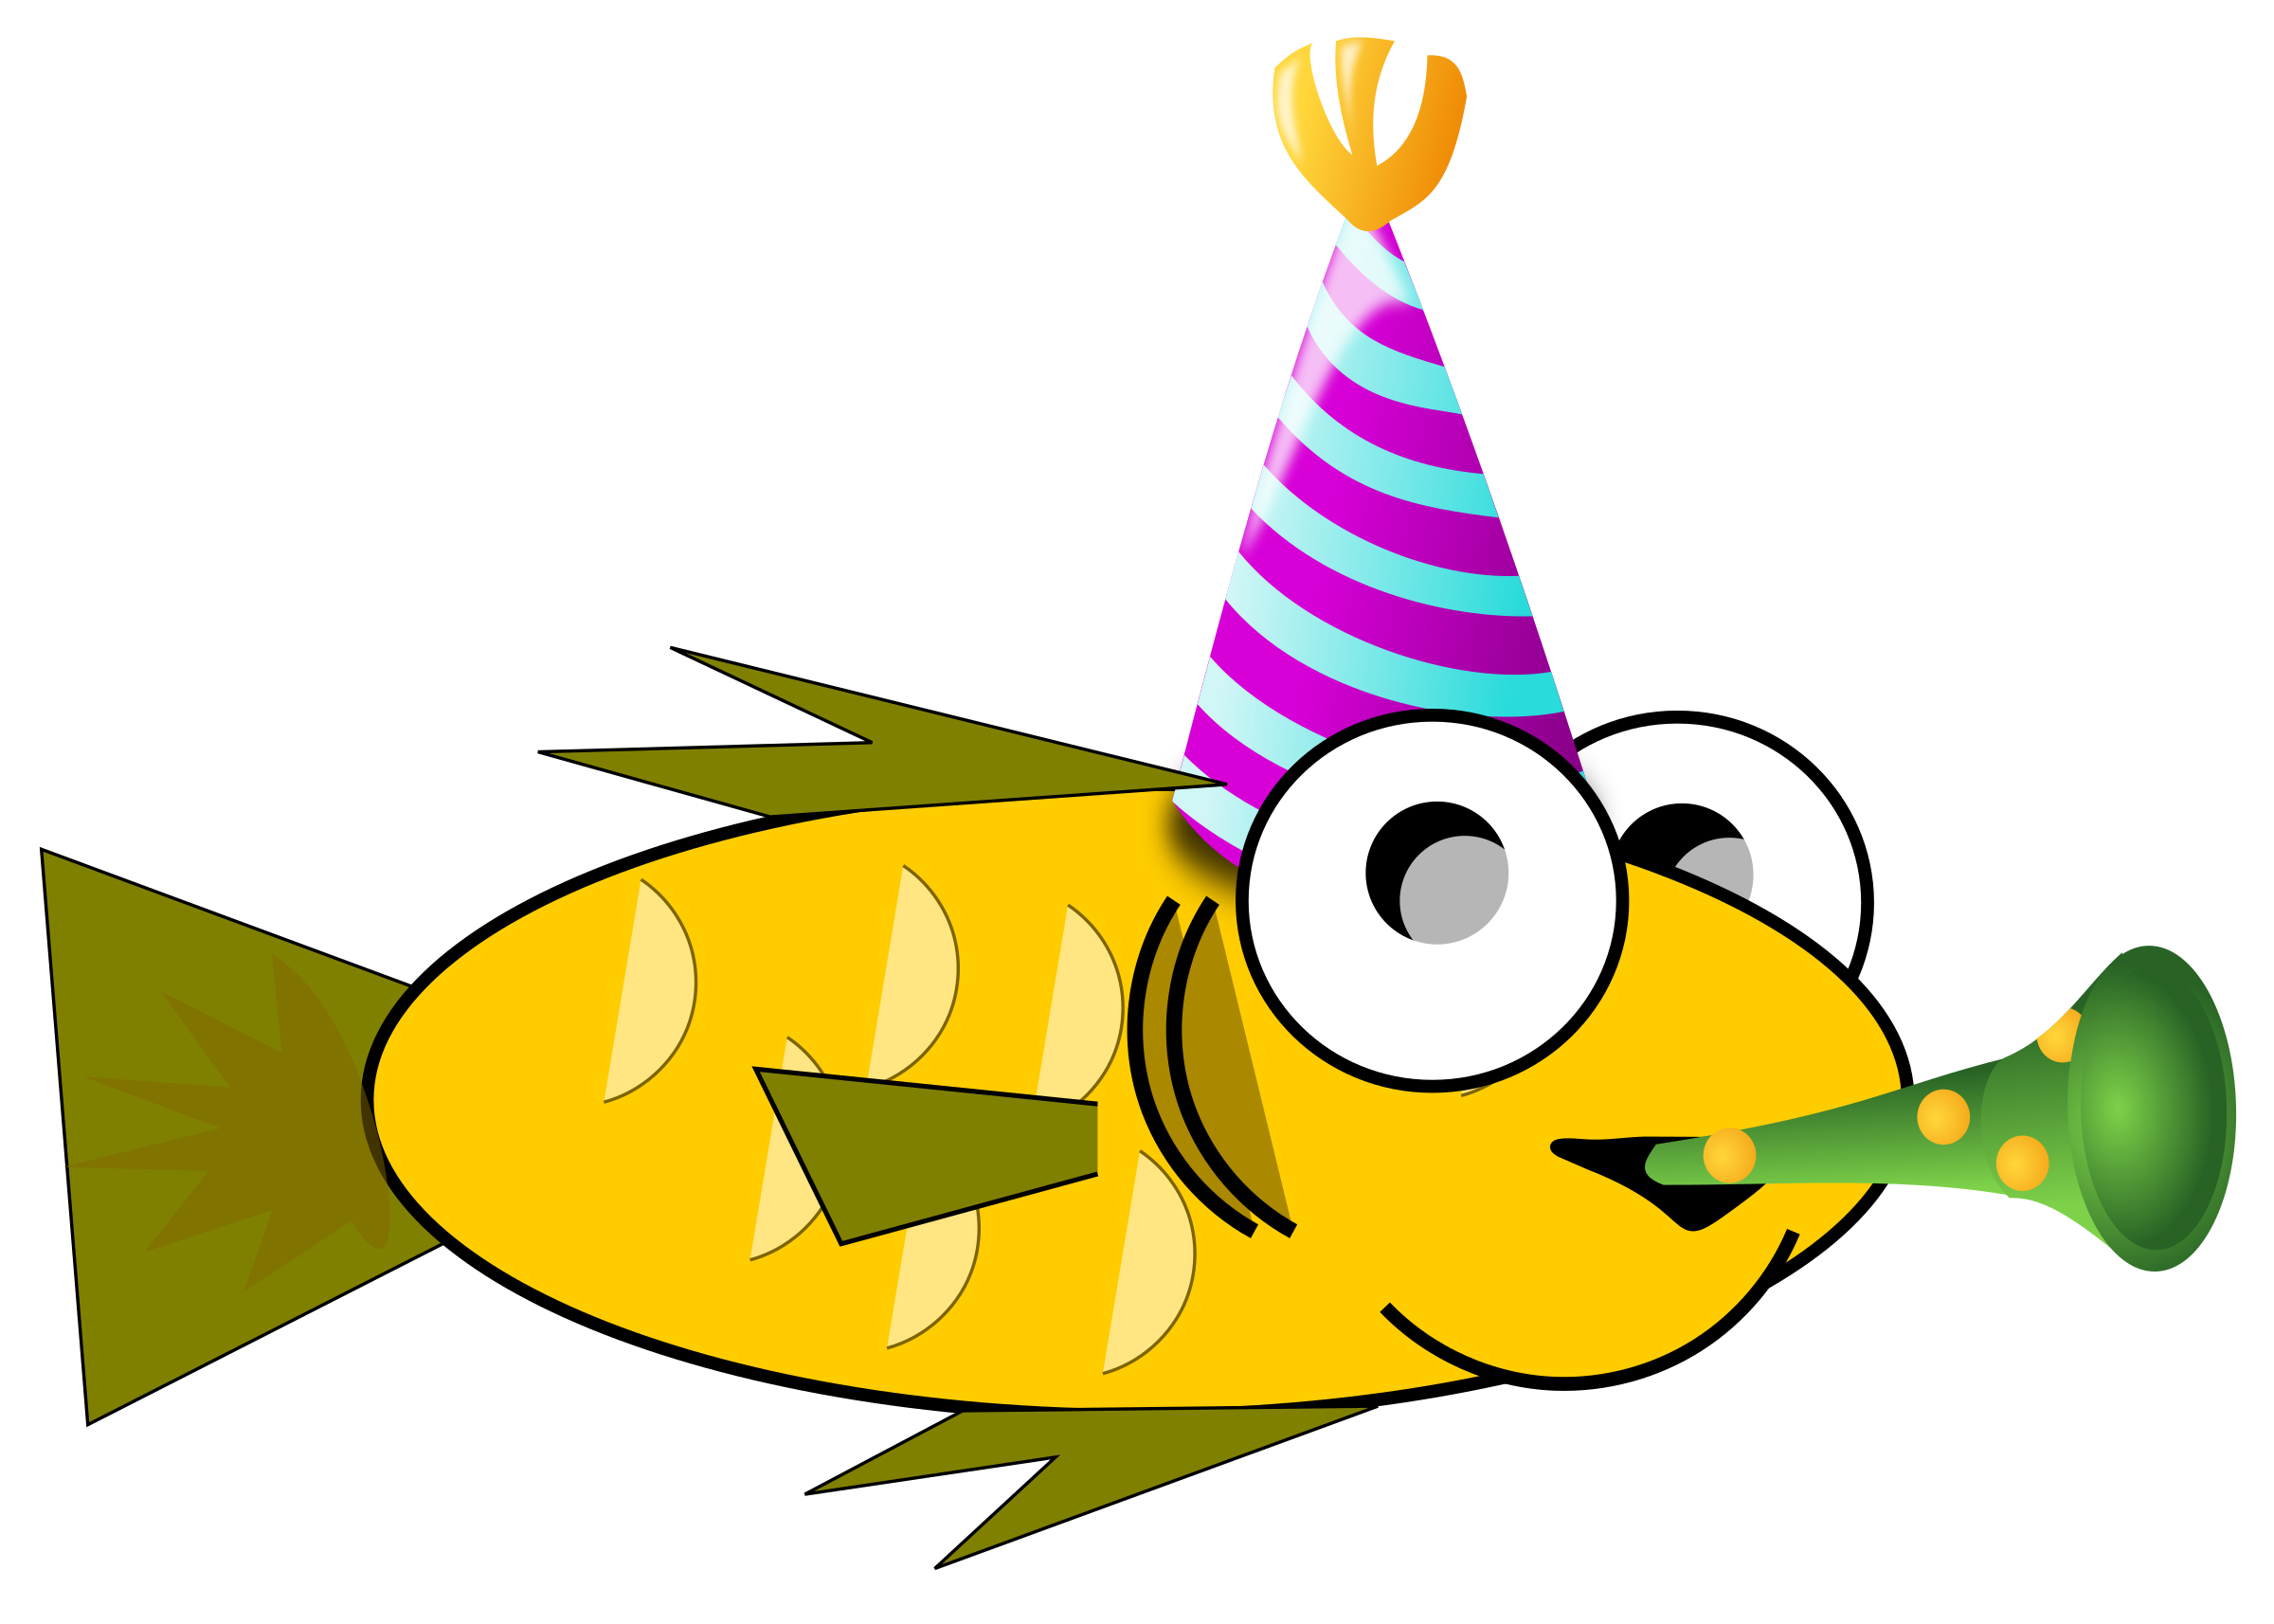 Judas tadeu aniversariante big. Horn clipart birthday